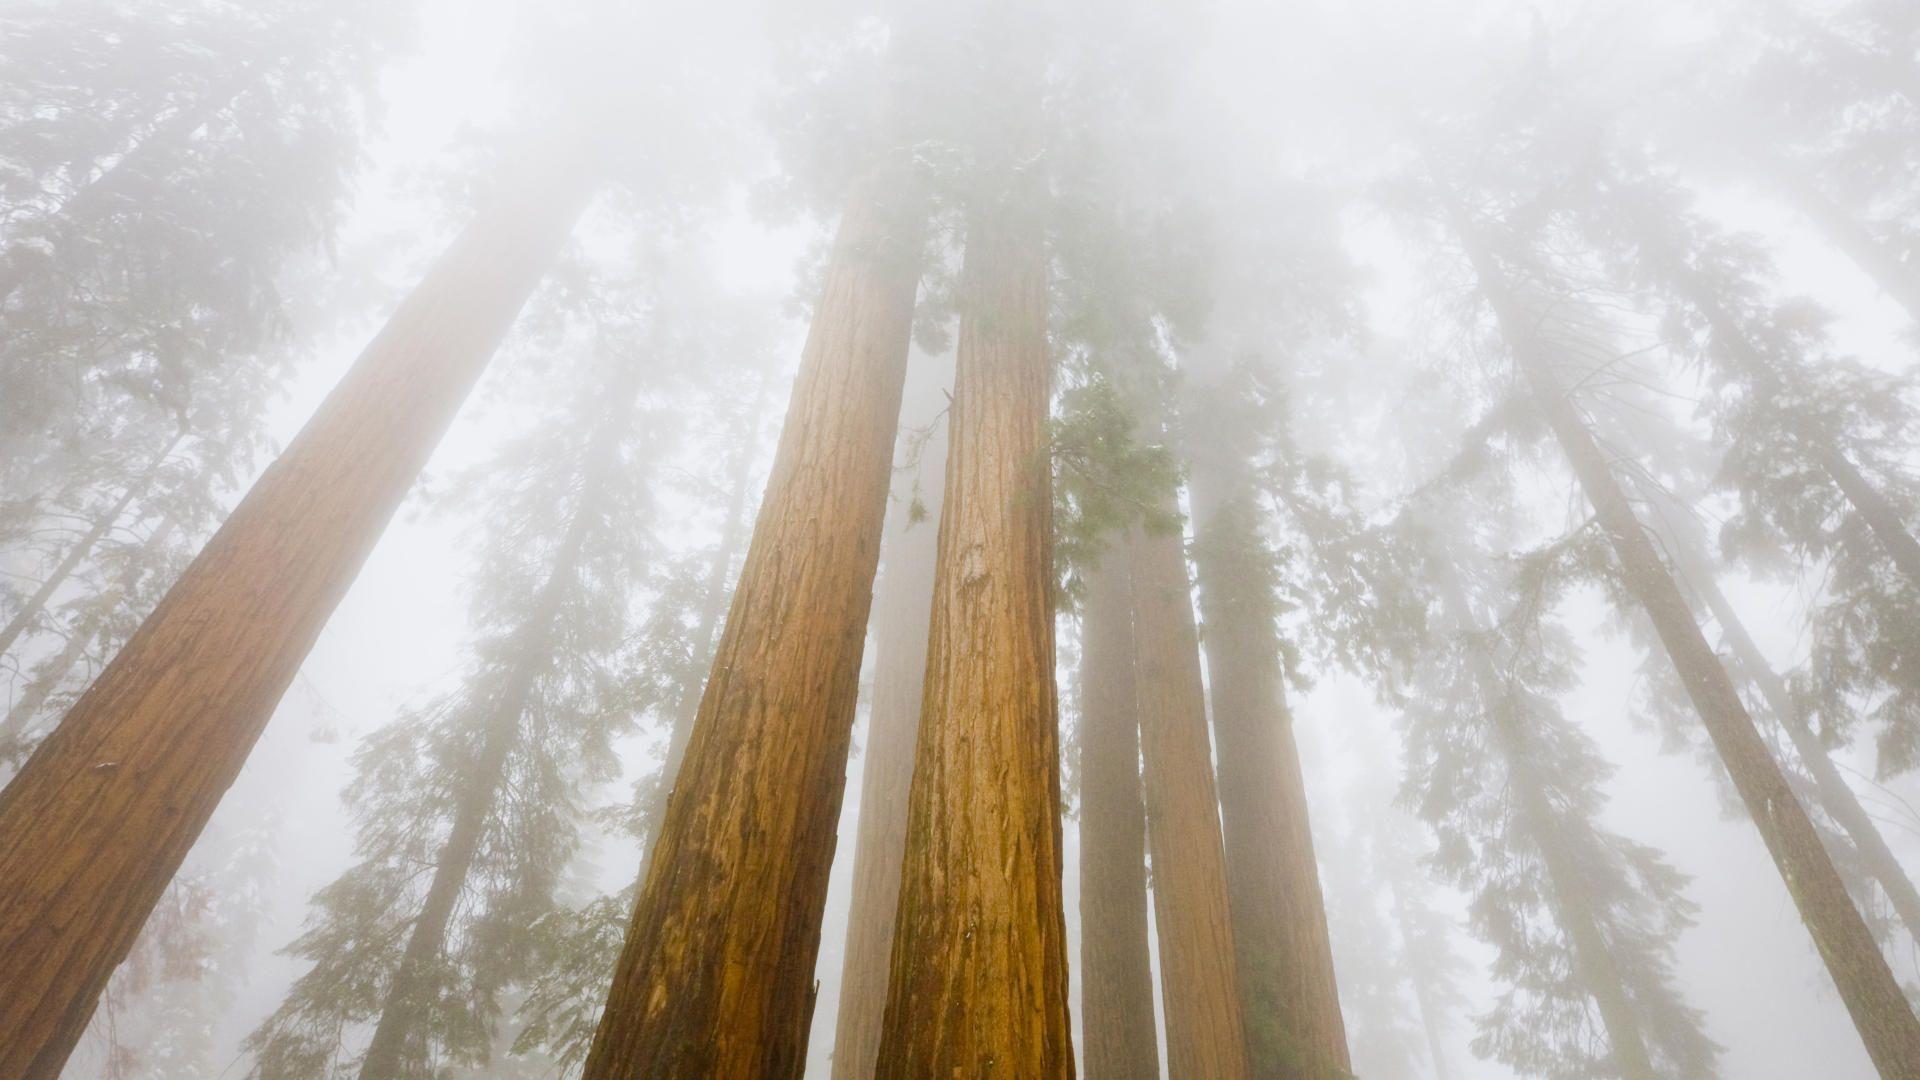 Foggy Sequoias Sequoia National Park California wallpaper 1920x1080